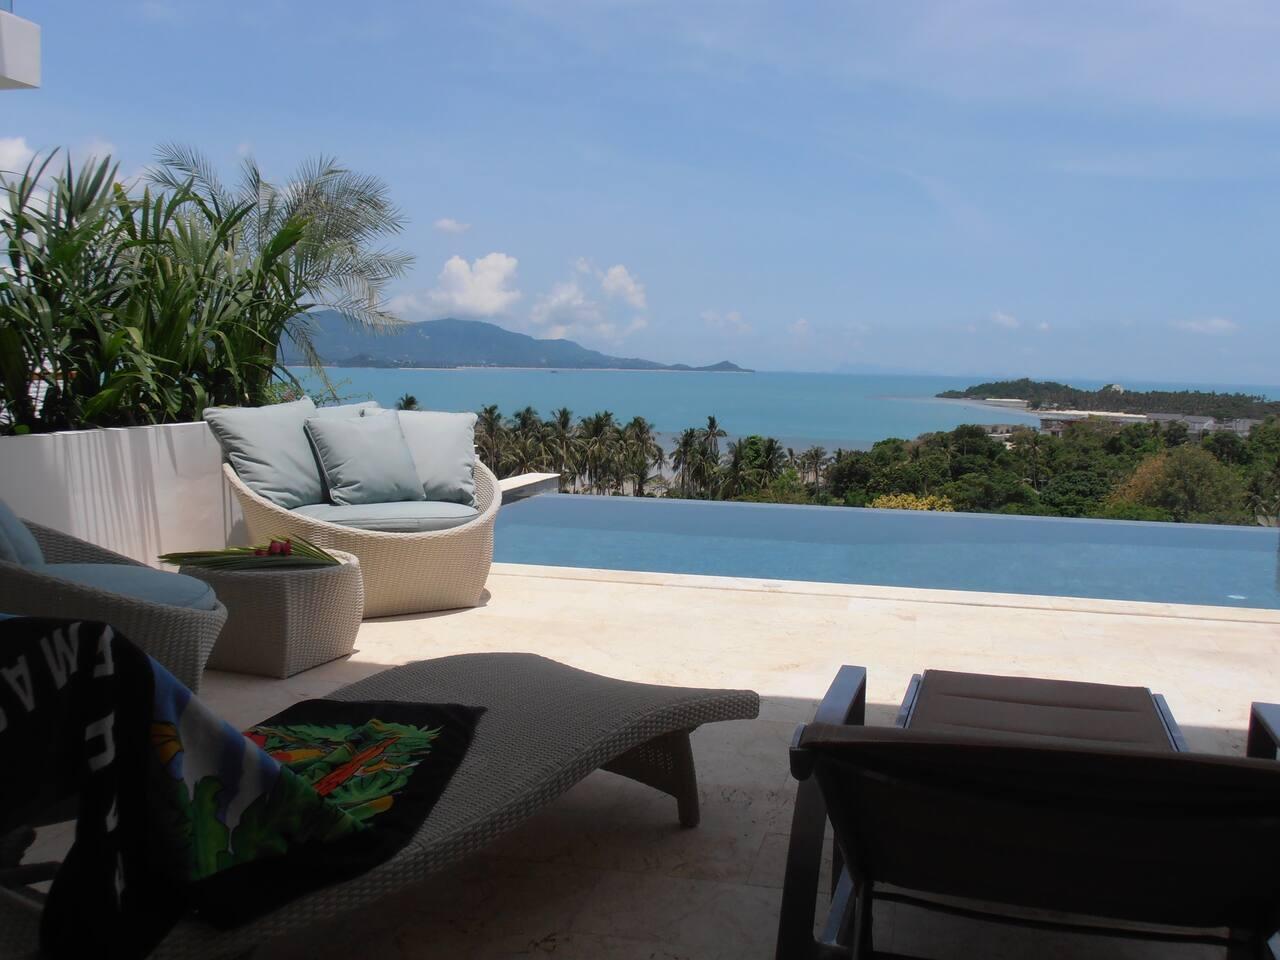 Samui Sunset Deluxe Villa with Beach Access วิลลา 3 ห้องนอน 3 ห้องน้ำส่วนตัว ขนาด 220 ตร.ม. – เชิงมน